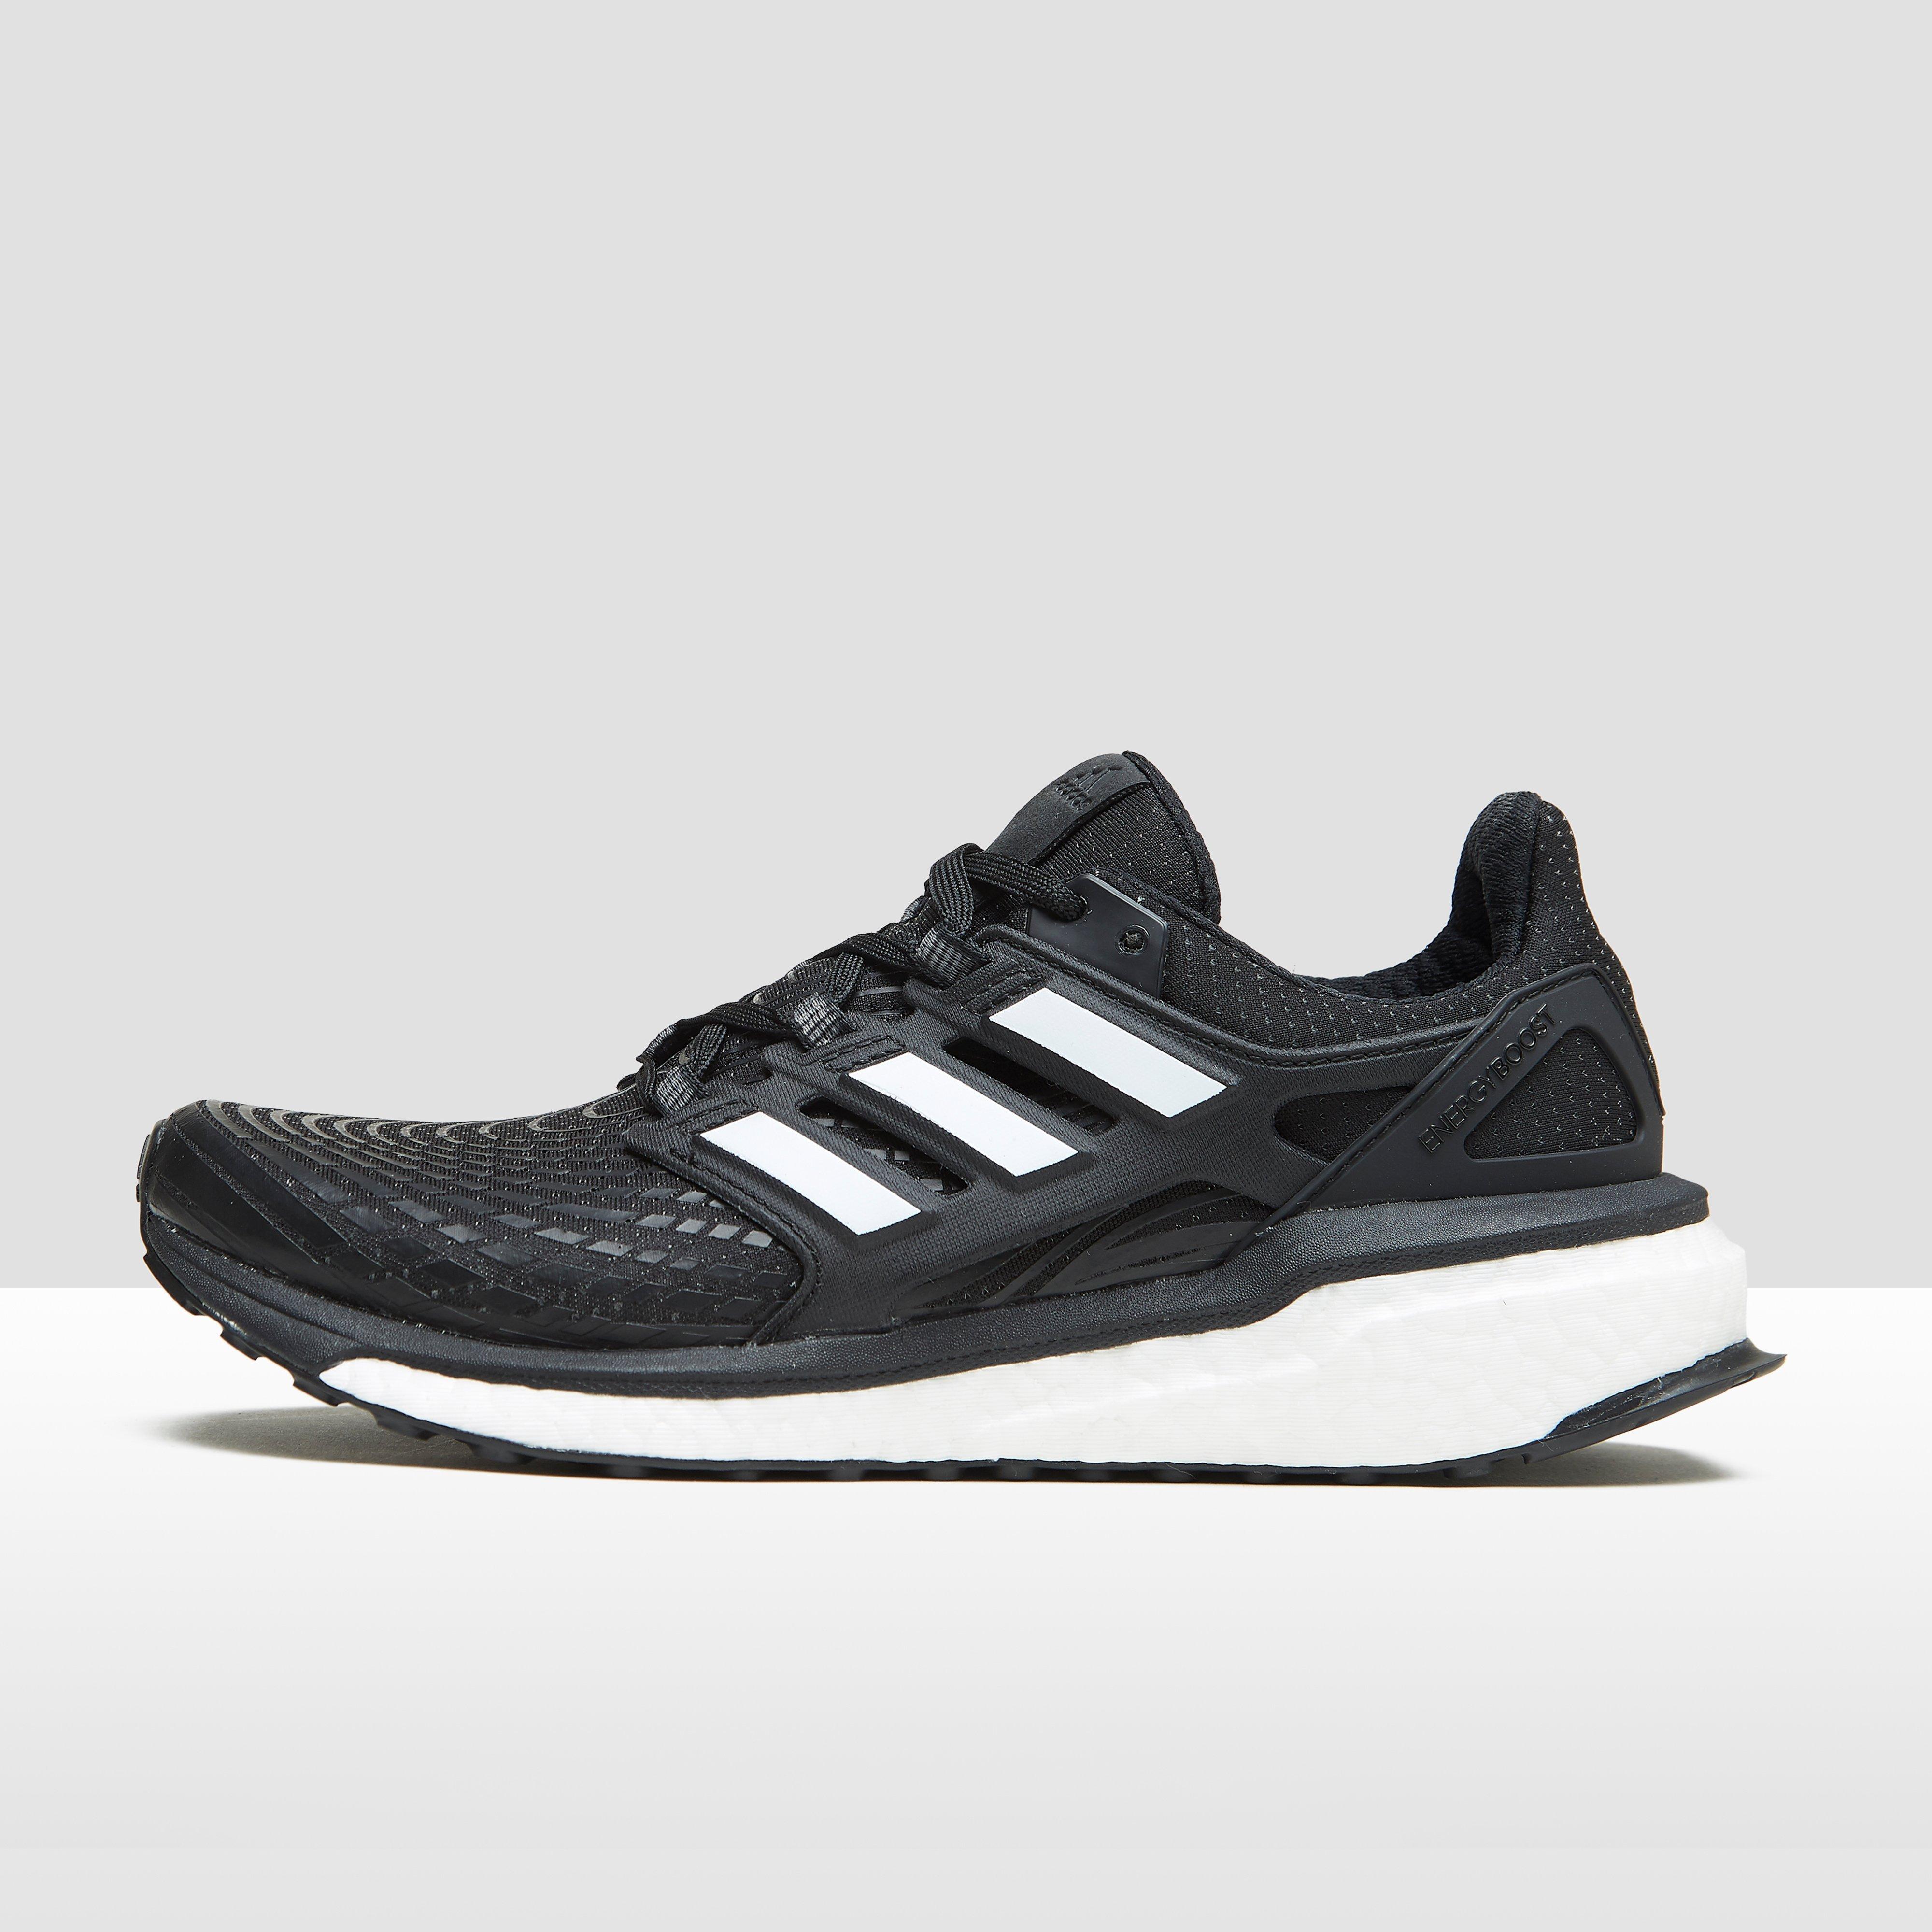 Adidas - Chaussures De Course Energyboost - Hommes - Chaussures - Noir - 42 089R8NJg